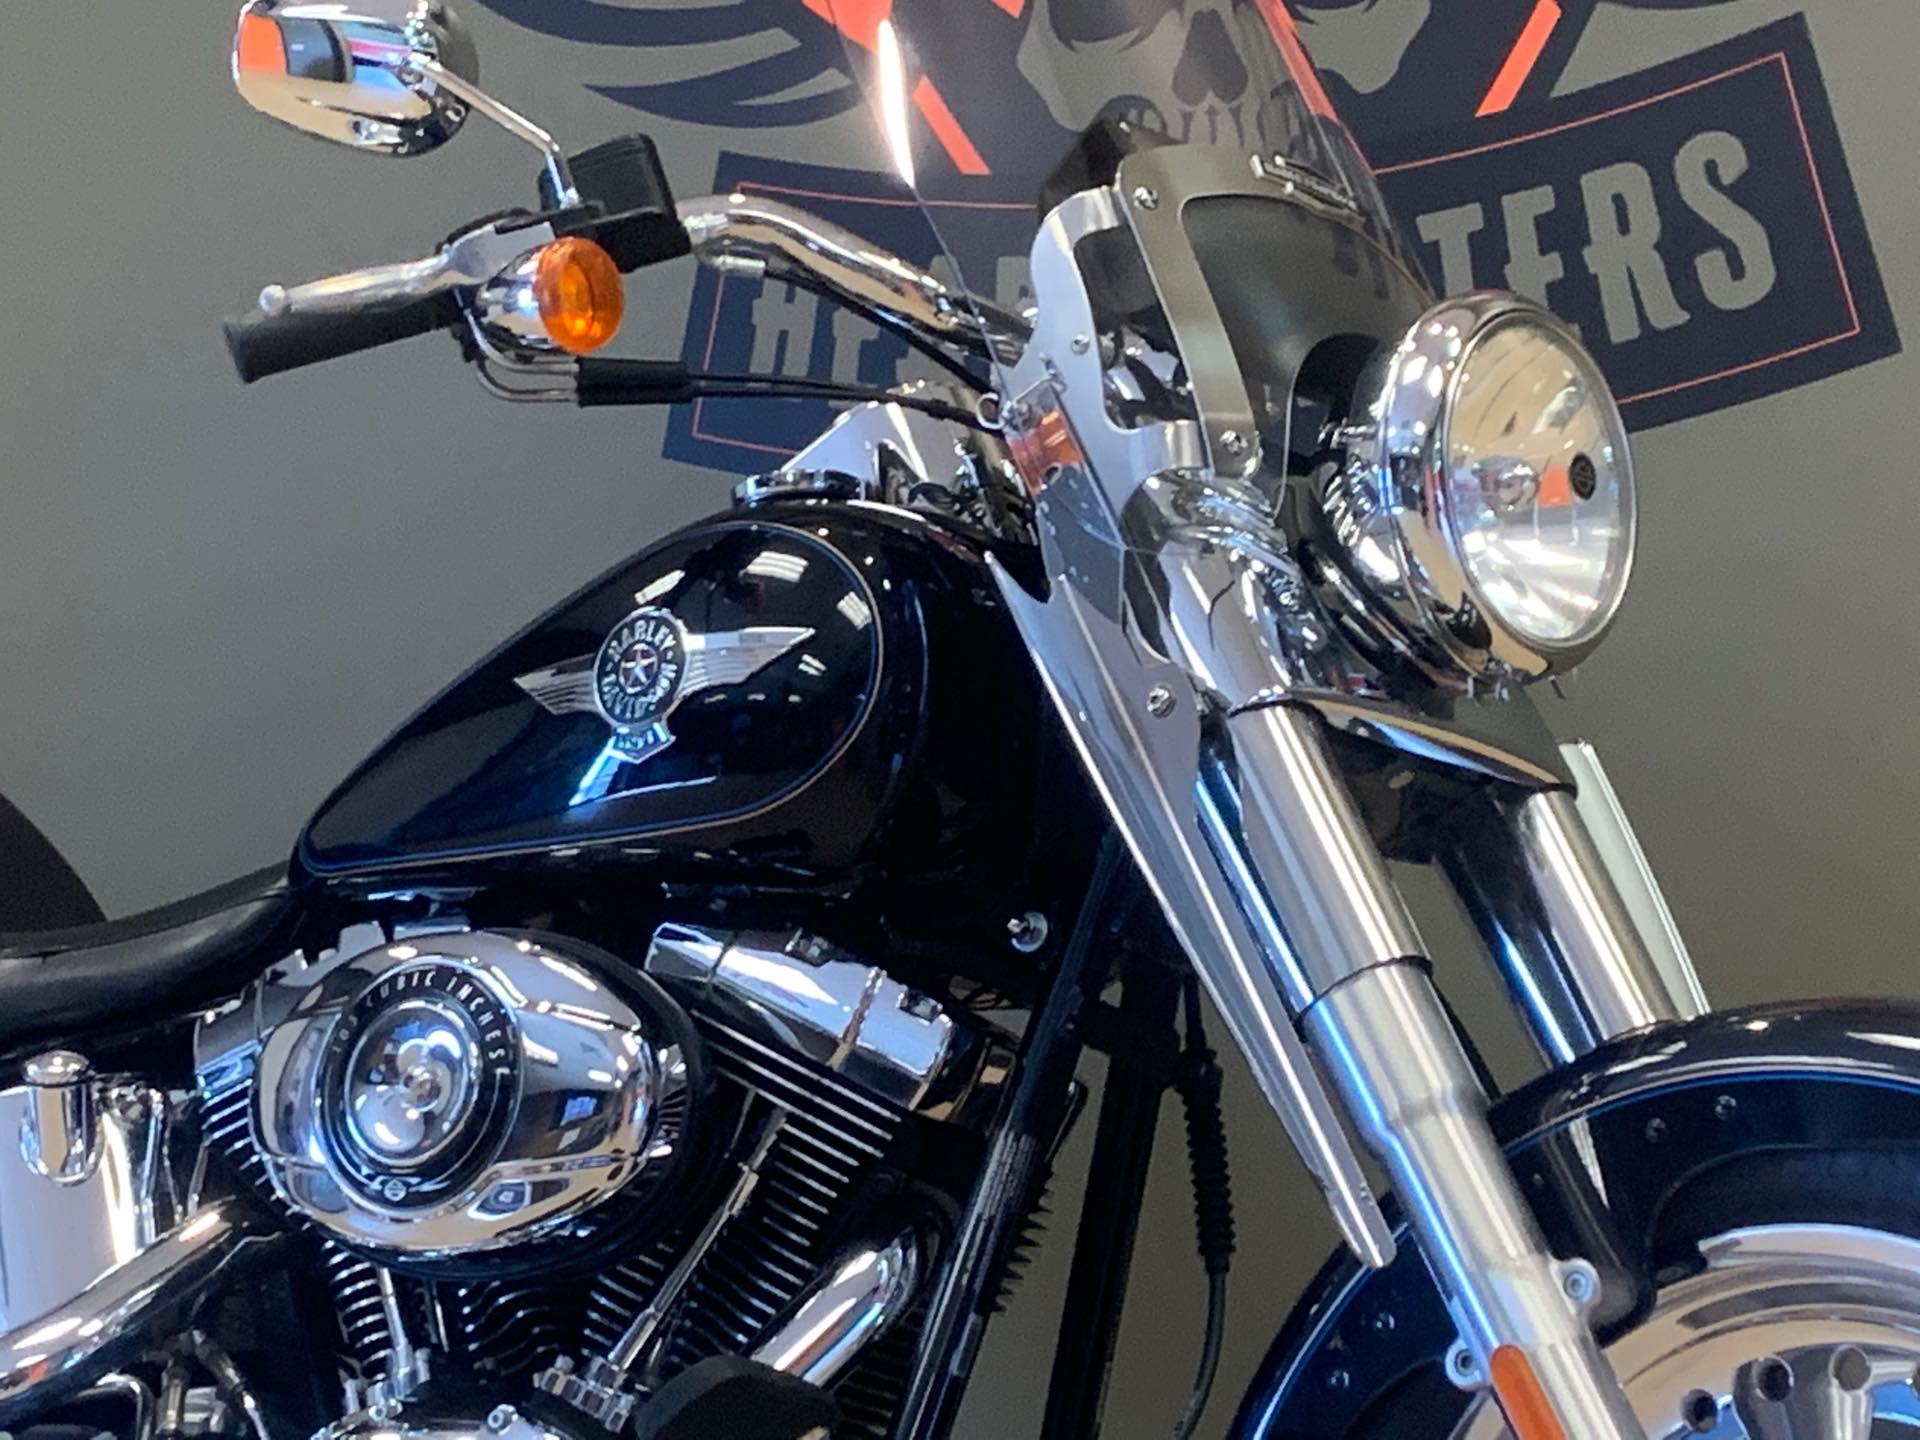 2013 Harley-Davidson Softail Fat Boy at Loess Hills Harley-Davidson